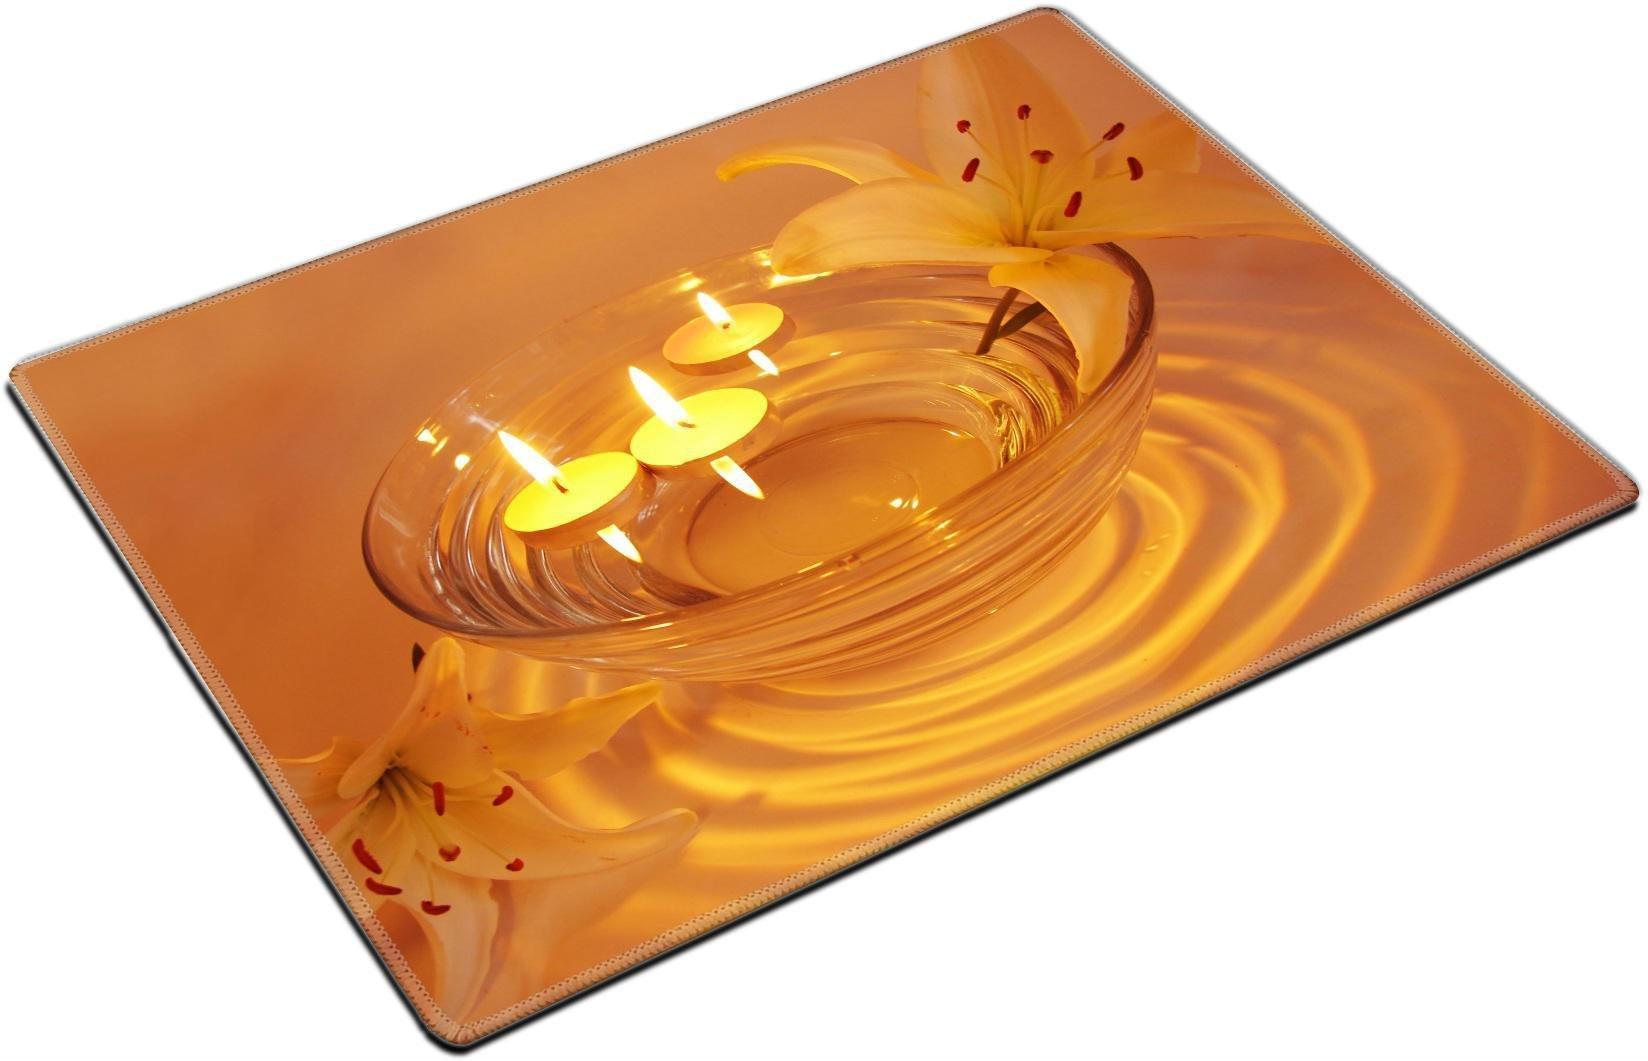 MSD Place Mat Non-Slip Natural Rubber Desk Pads Design: 11331697 Spa Lit Candles Lilies Flowers Health Care Treatment